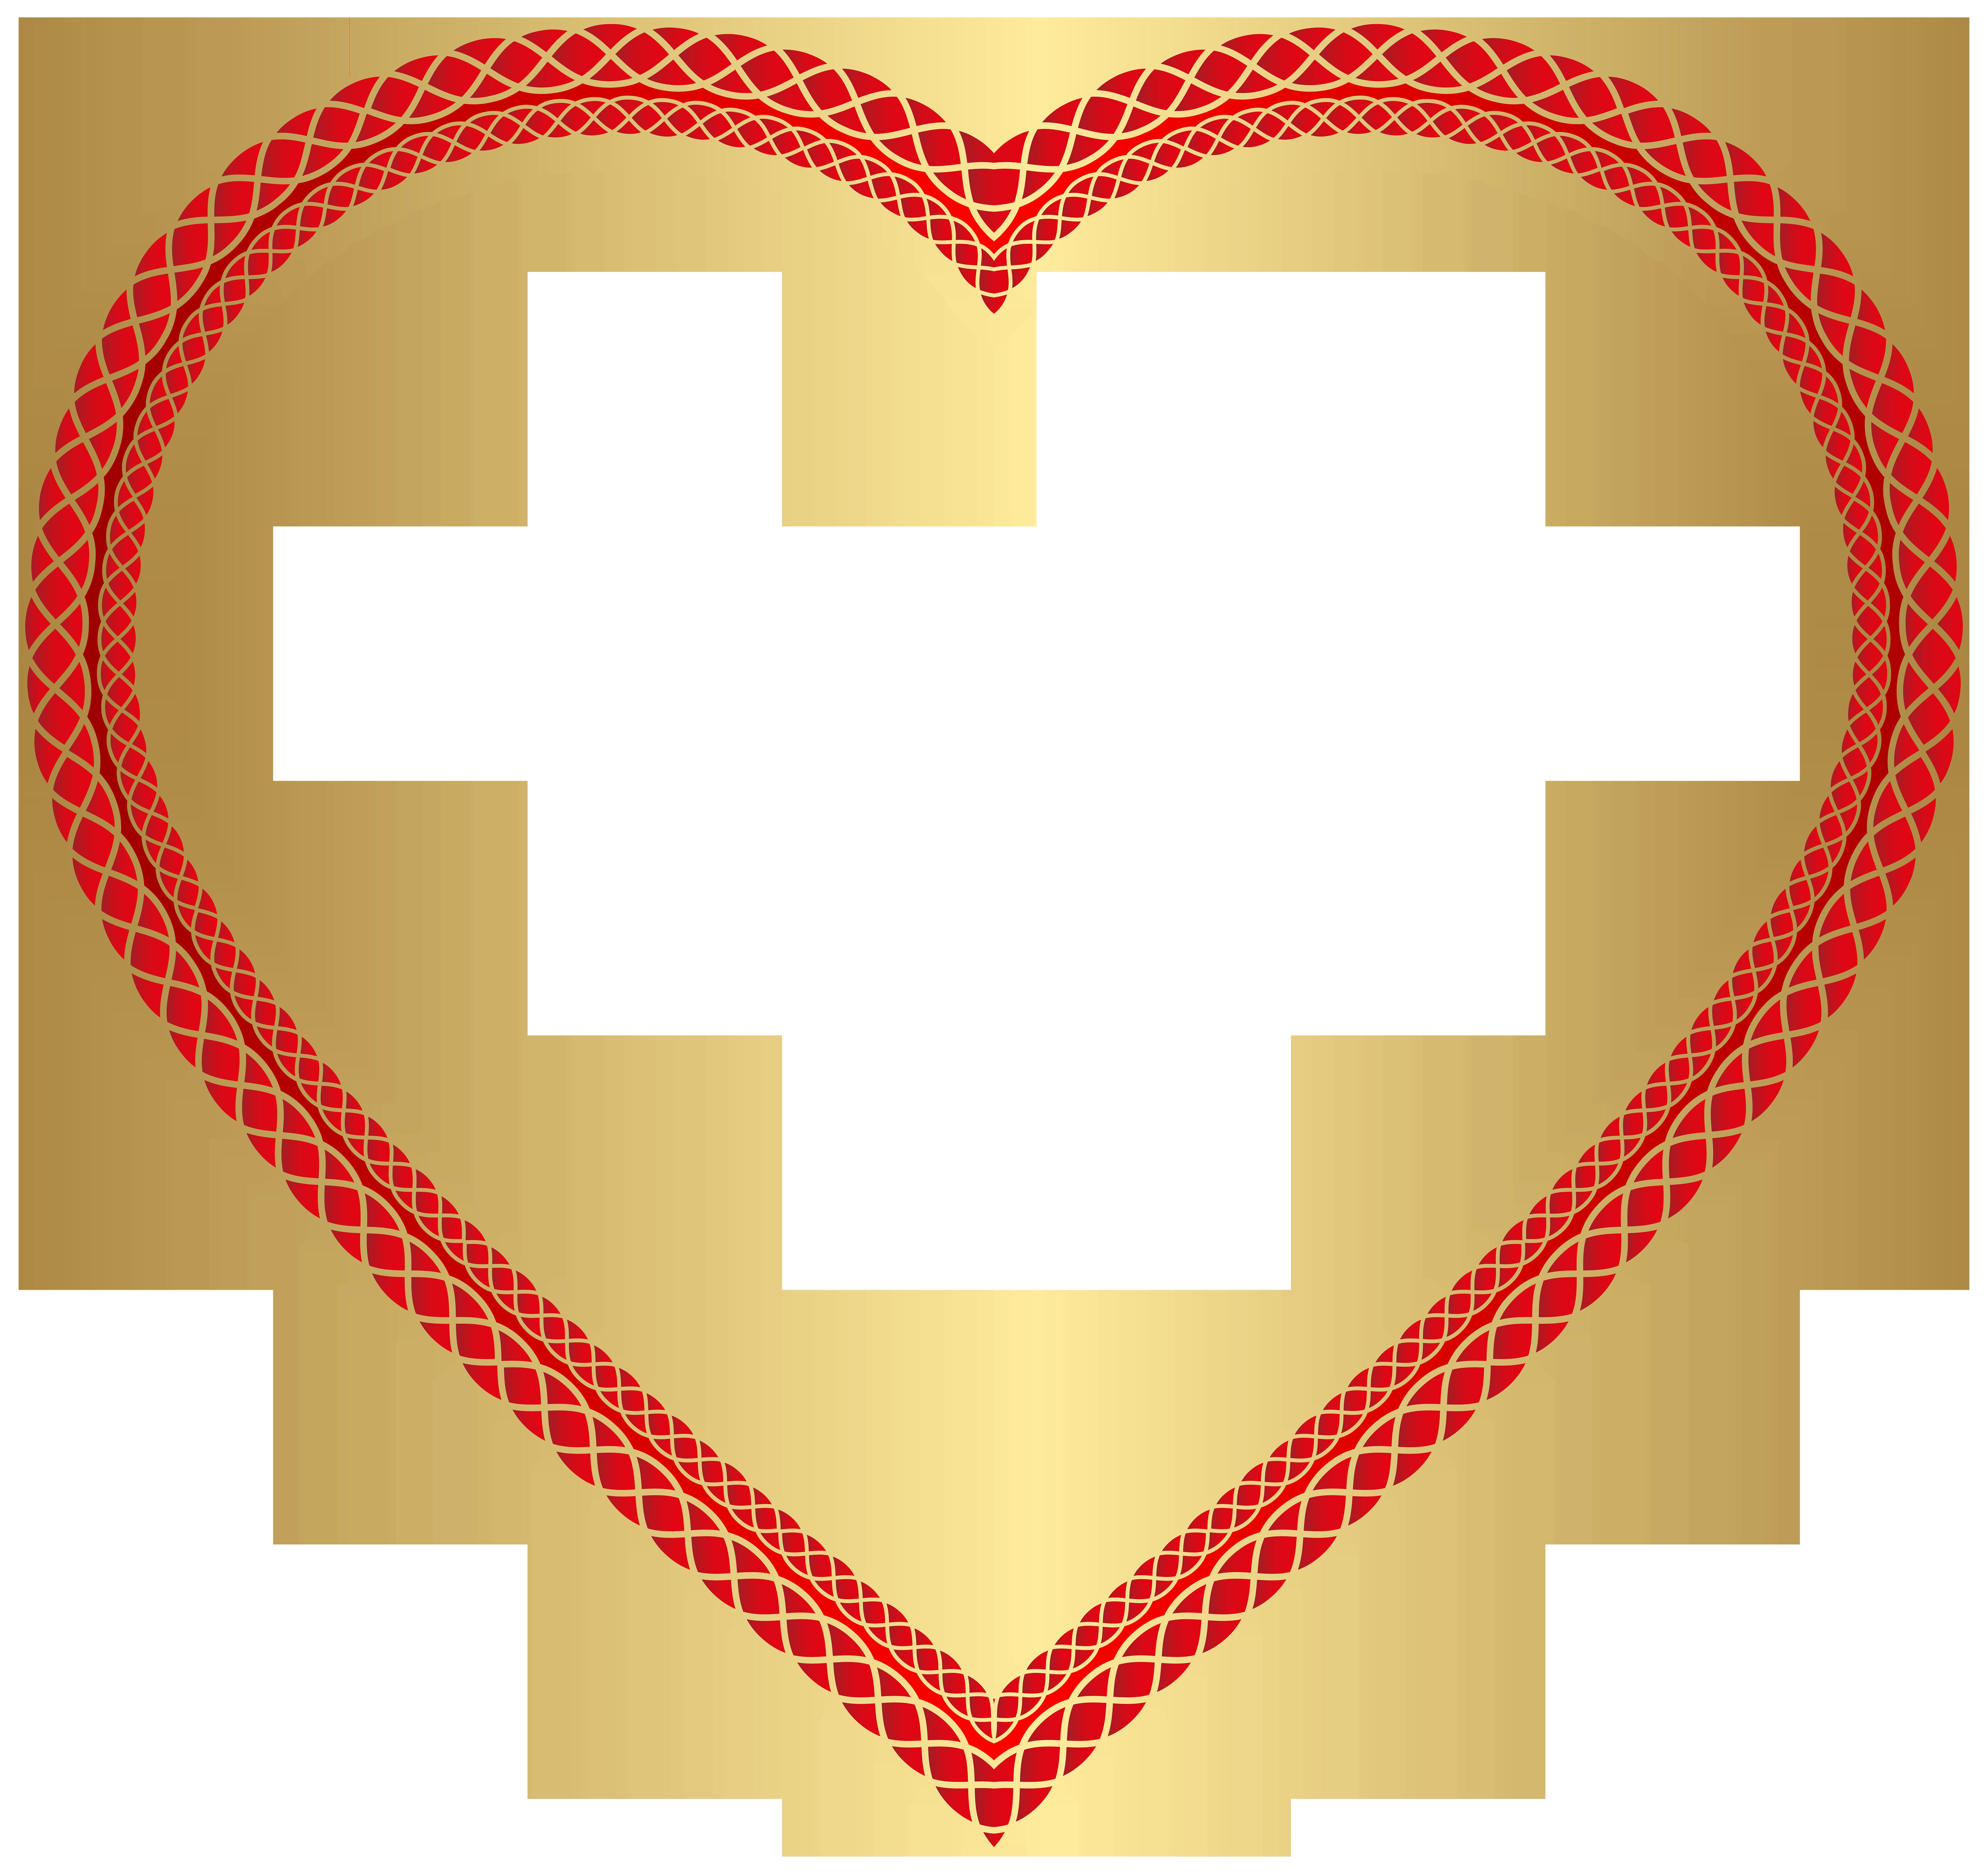 February clipart heart shape design. Transparent clip art image